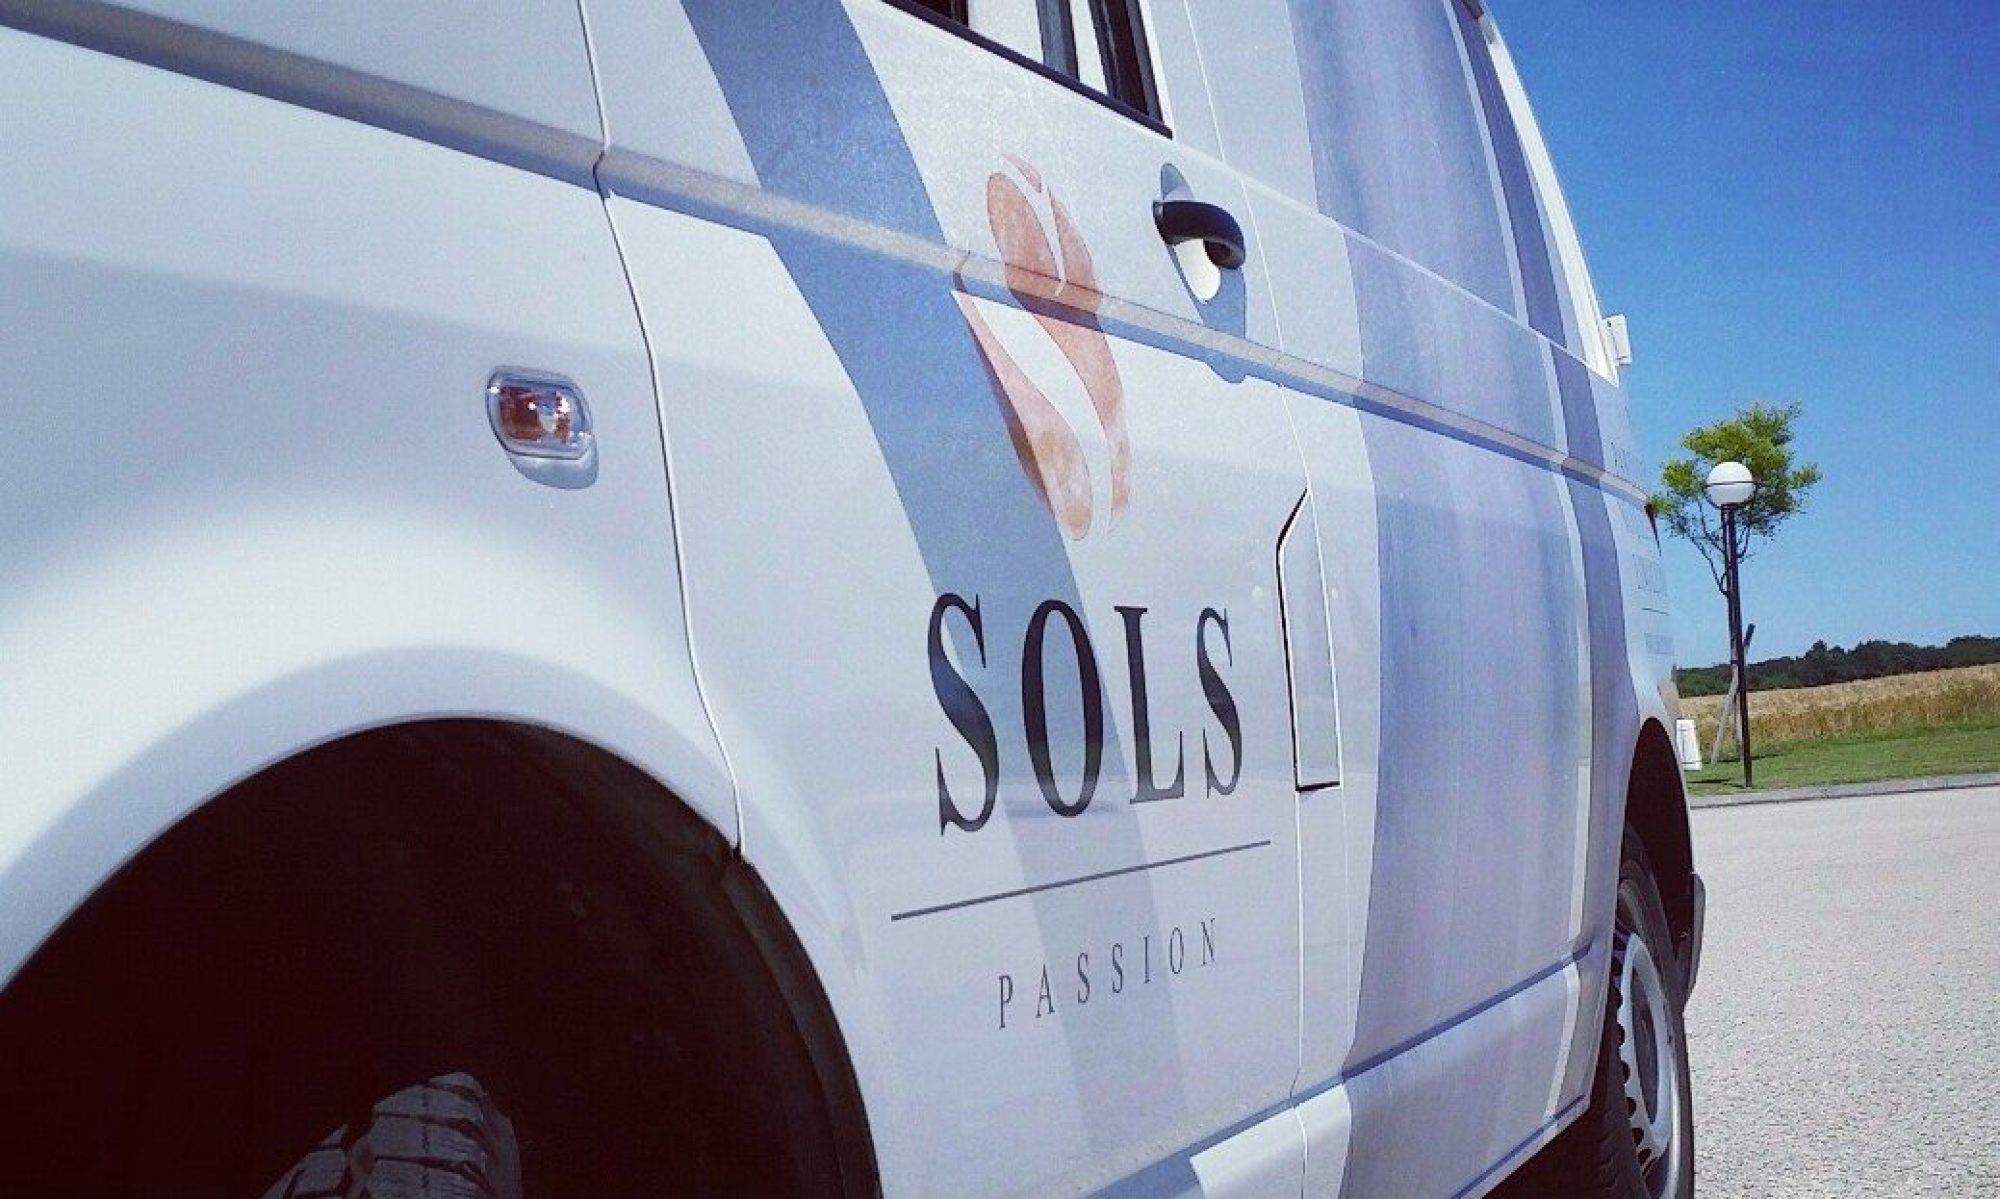 SolsPassion.ch